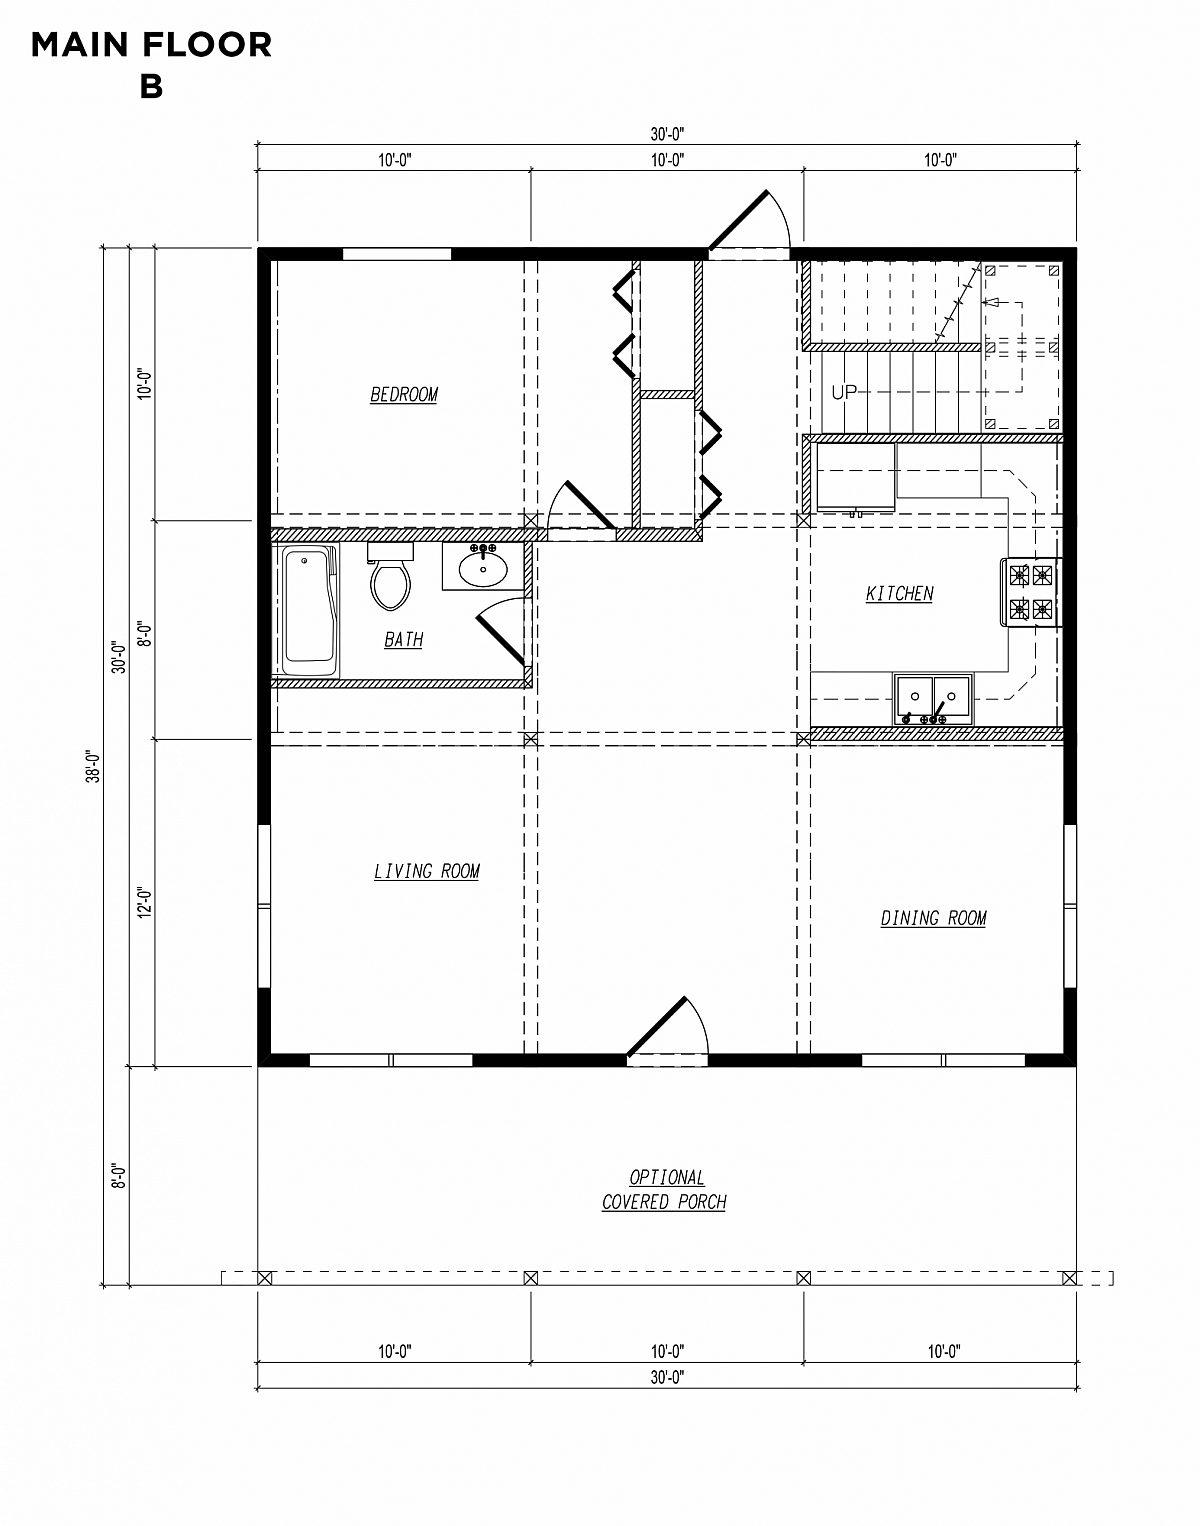 Timberlyne Blue Jay Cabin 30x30 Floor Plan Main B